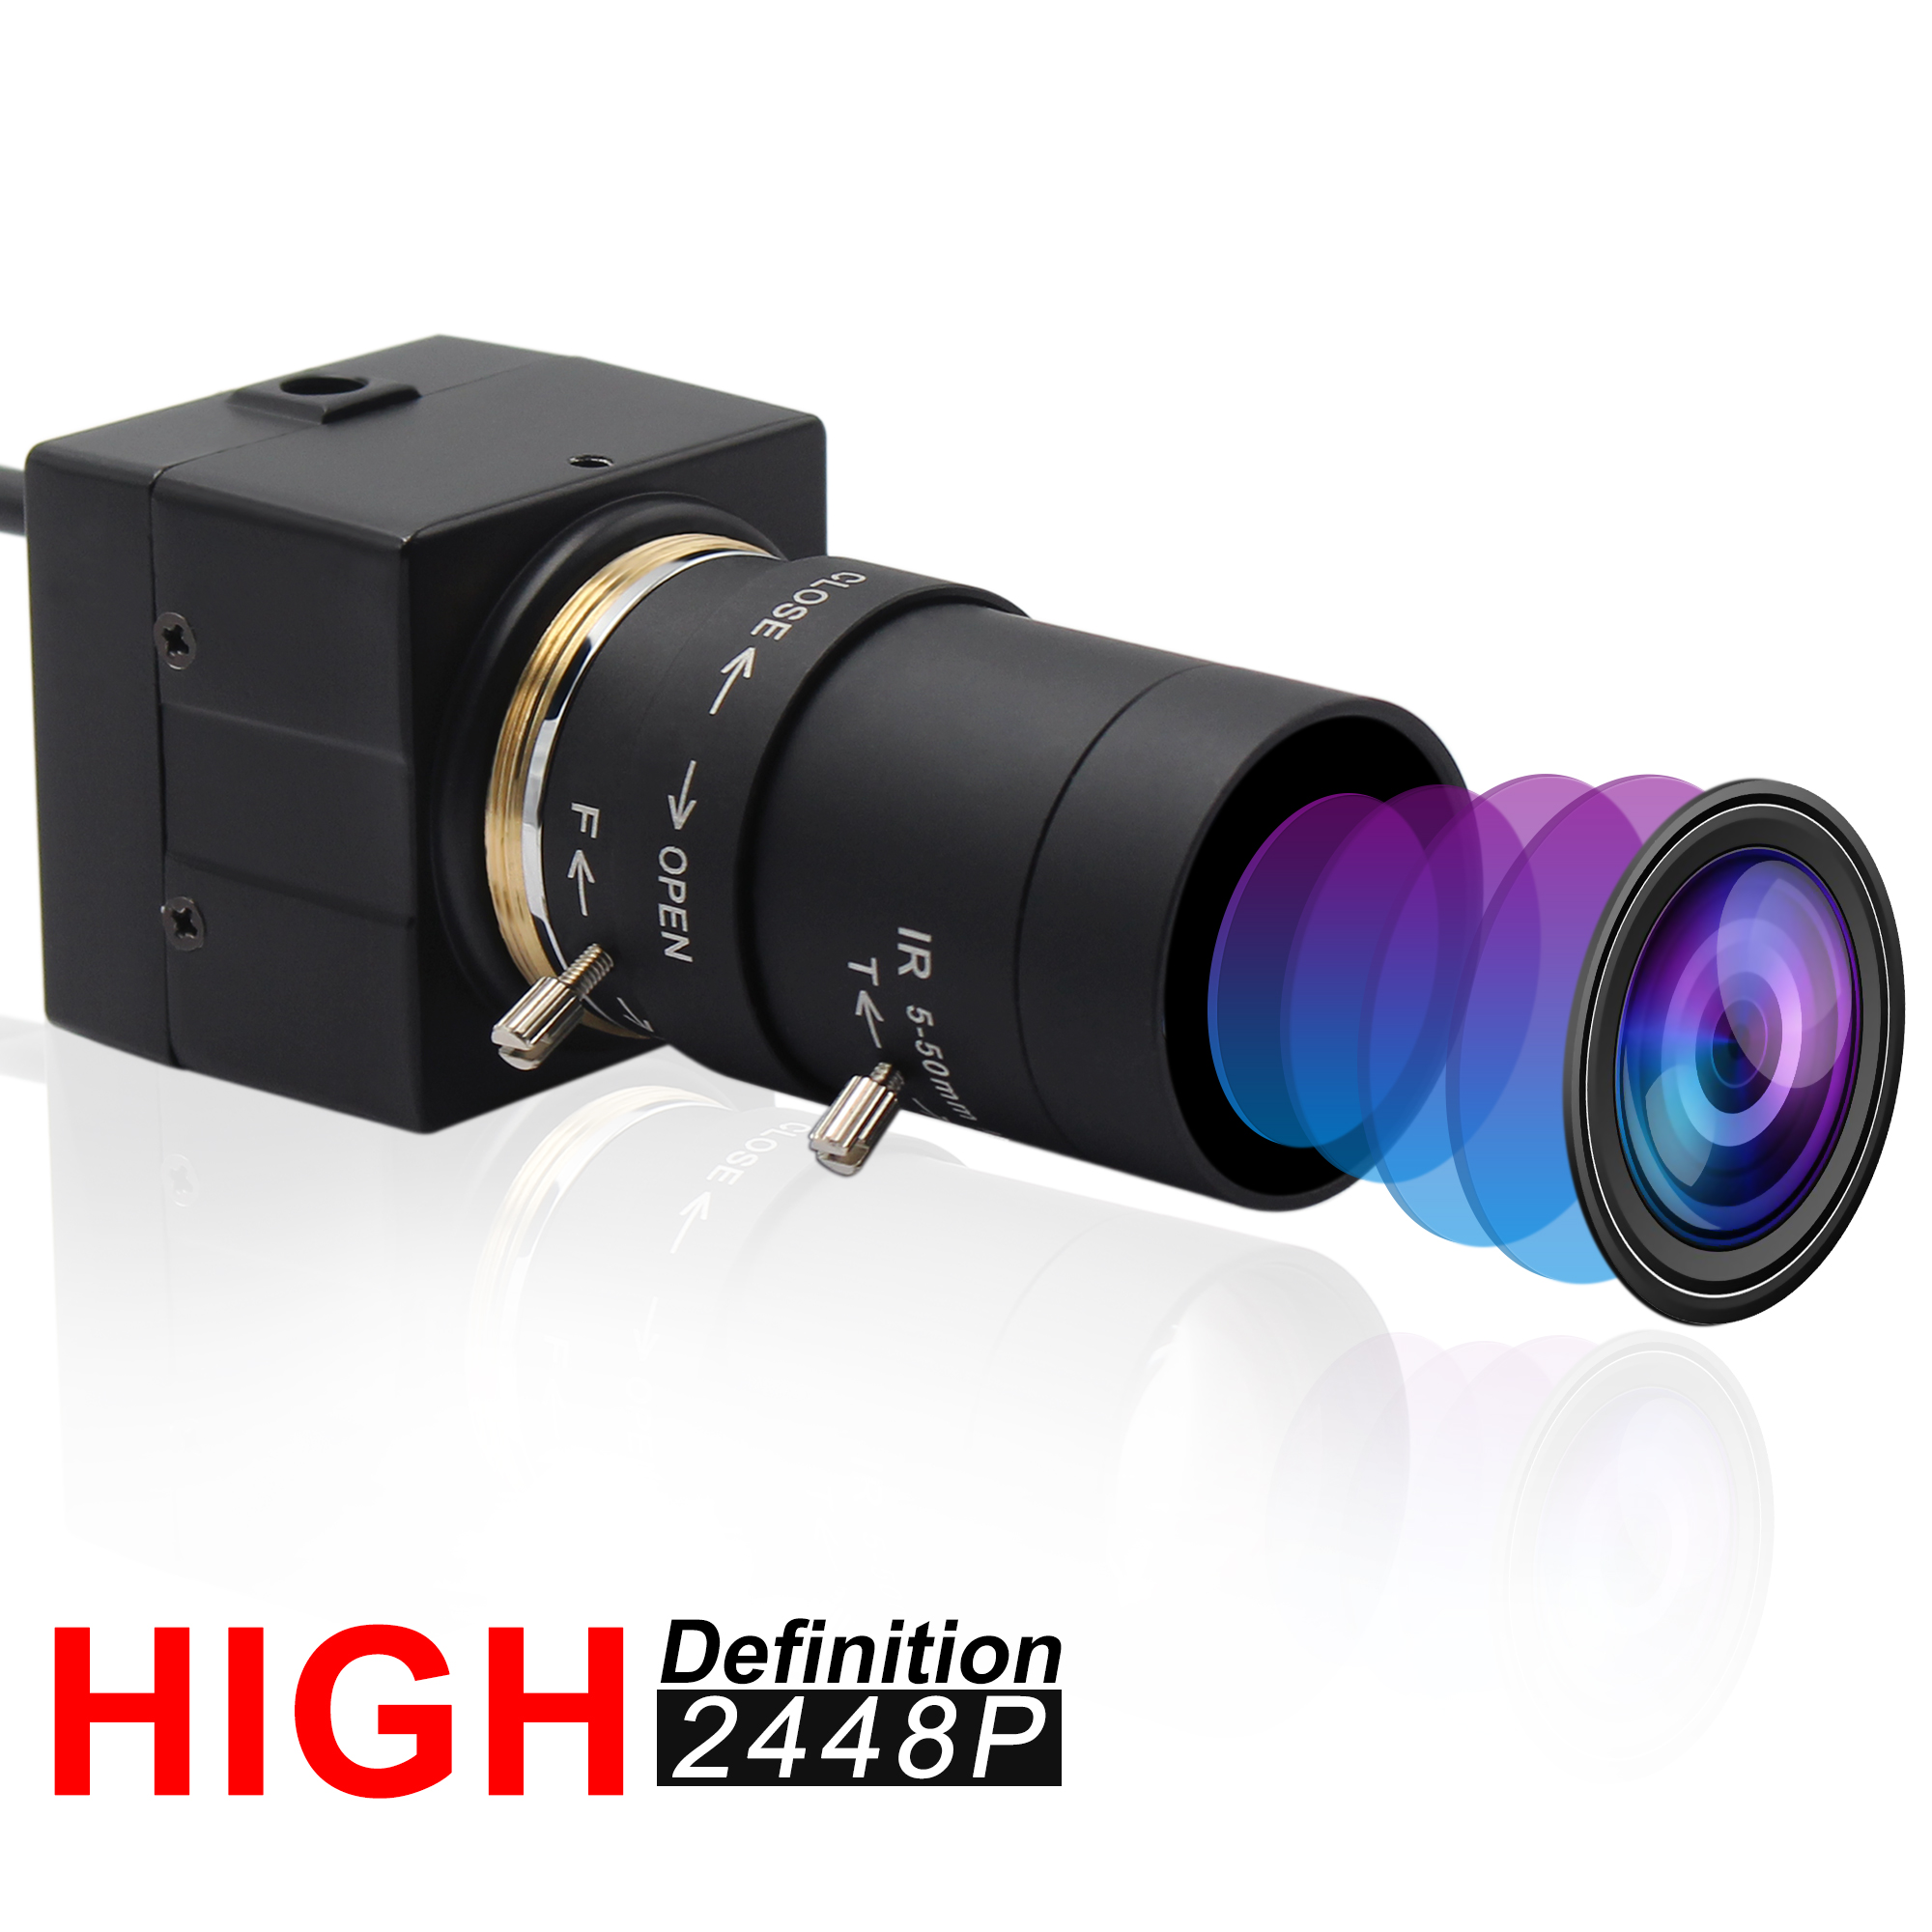 8MP 3264X2448 Sony IMX179 CCTV USB Camera 5-50mm Varifocal CS lens Hd USB Industrial Box Inside Surveillance USB Camera Webcam